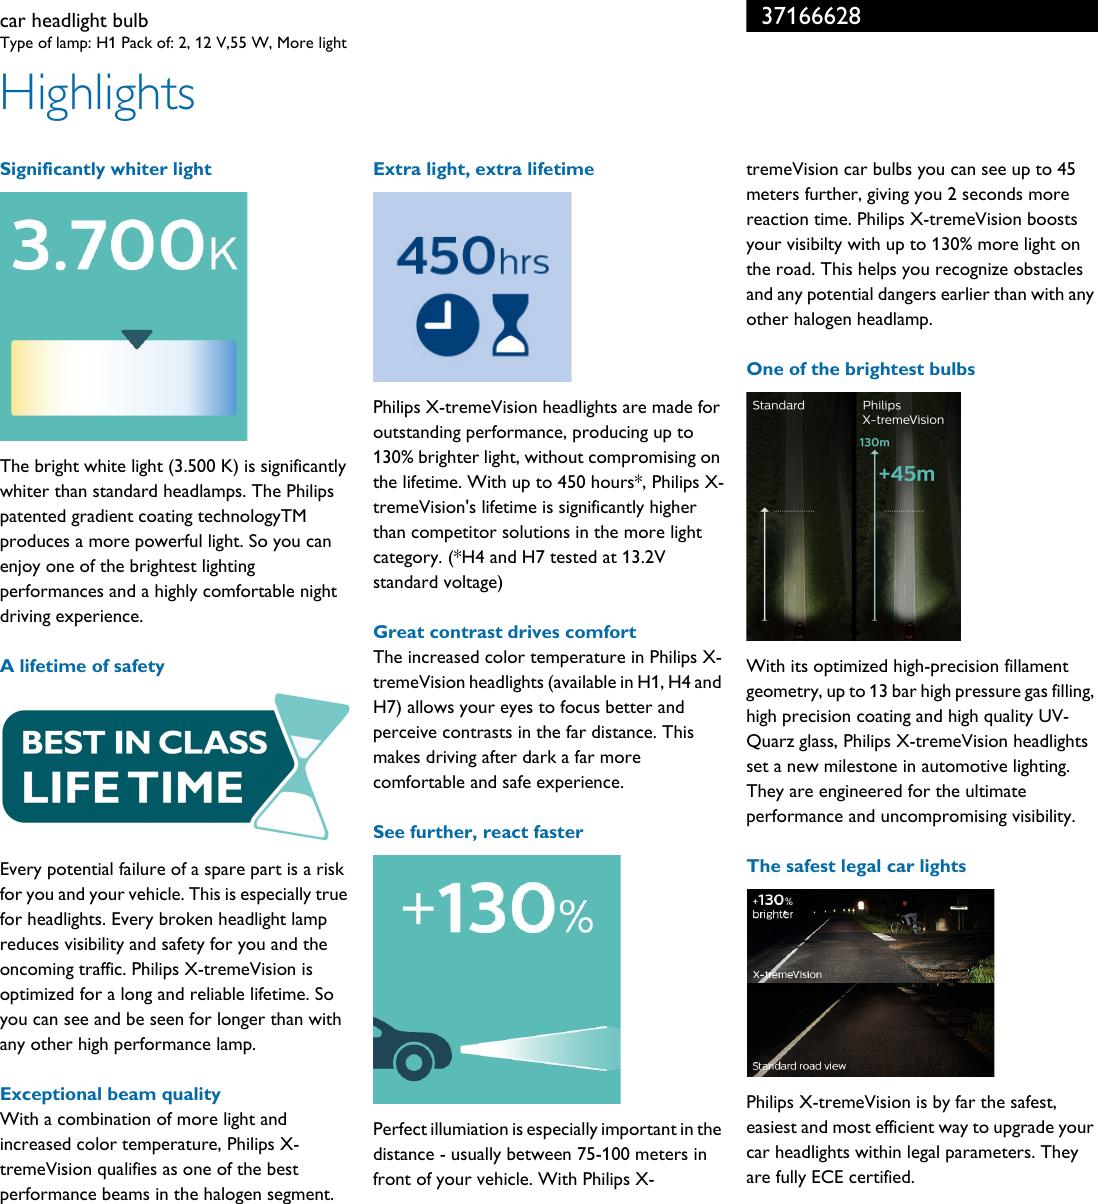 Philips 12258XV+S2 37166628 Car Headlight Bulb User Manual